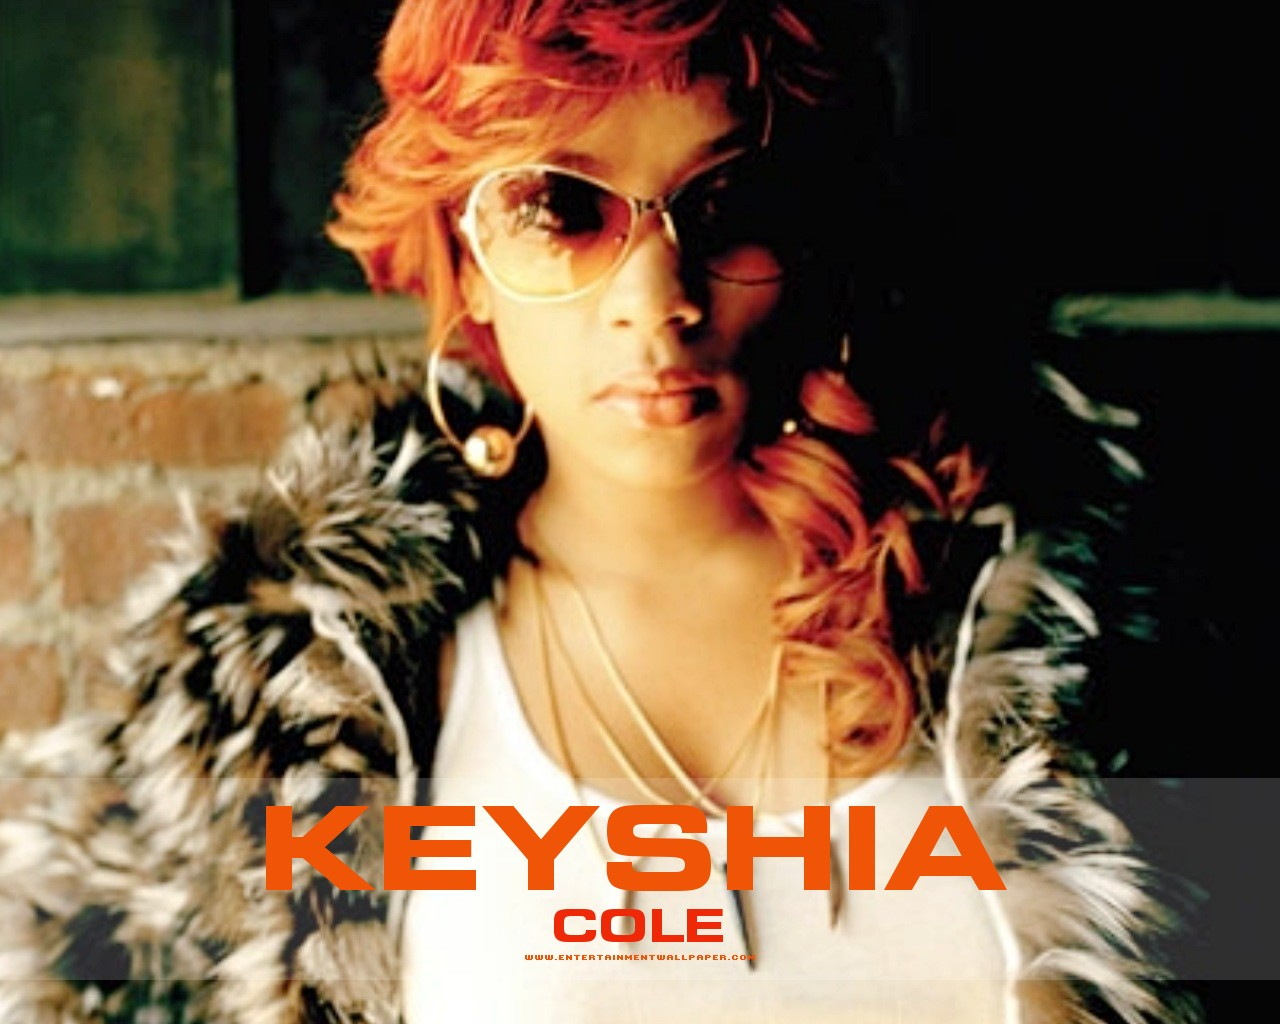 Keyshia Cole Hairstyle Trends: Keyshia Cole Desktop Wallpapers